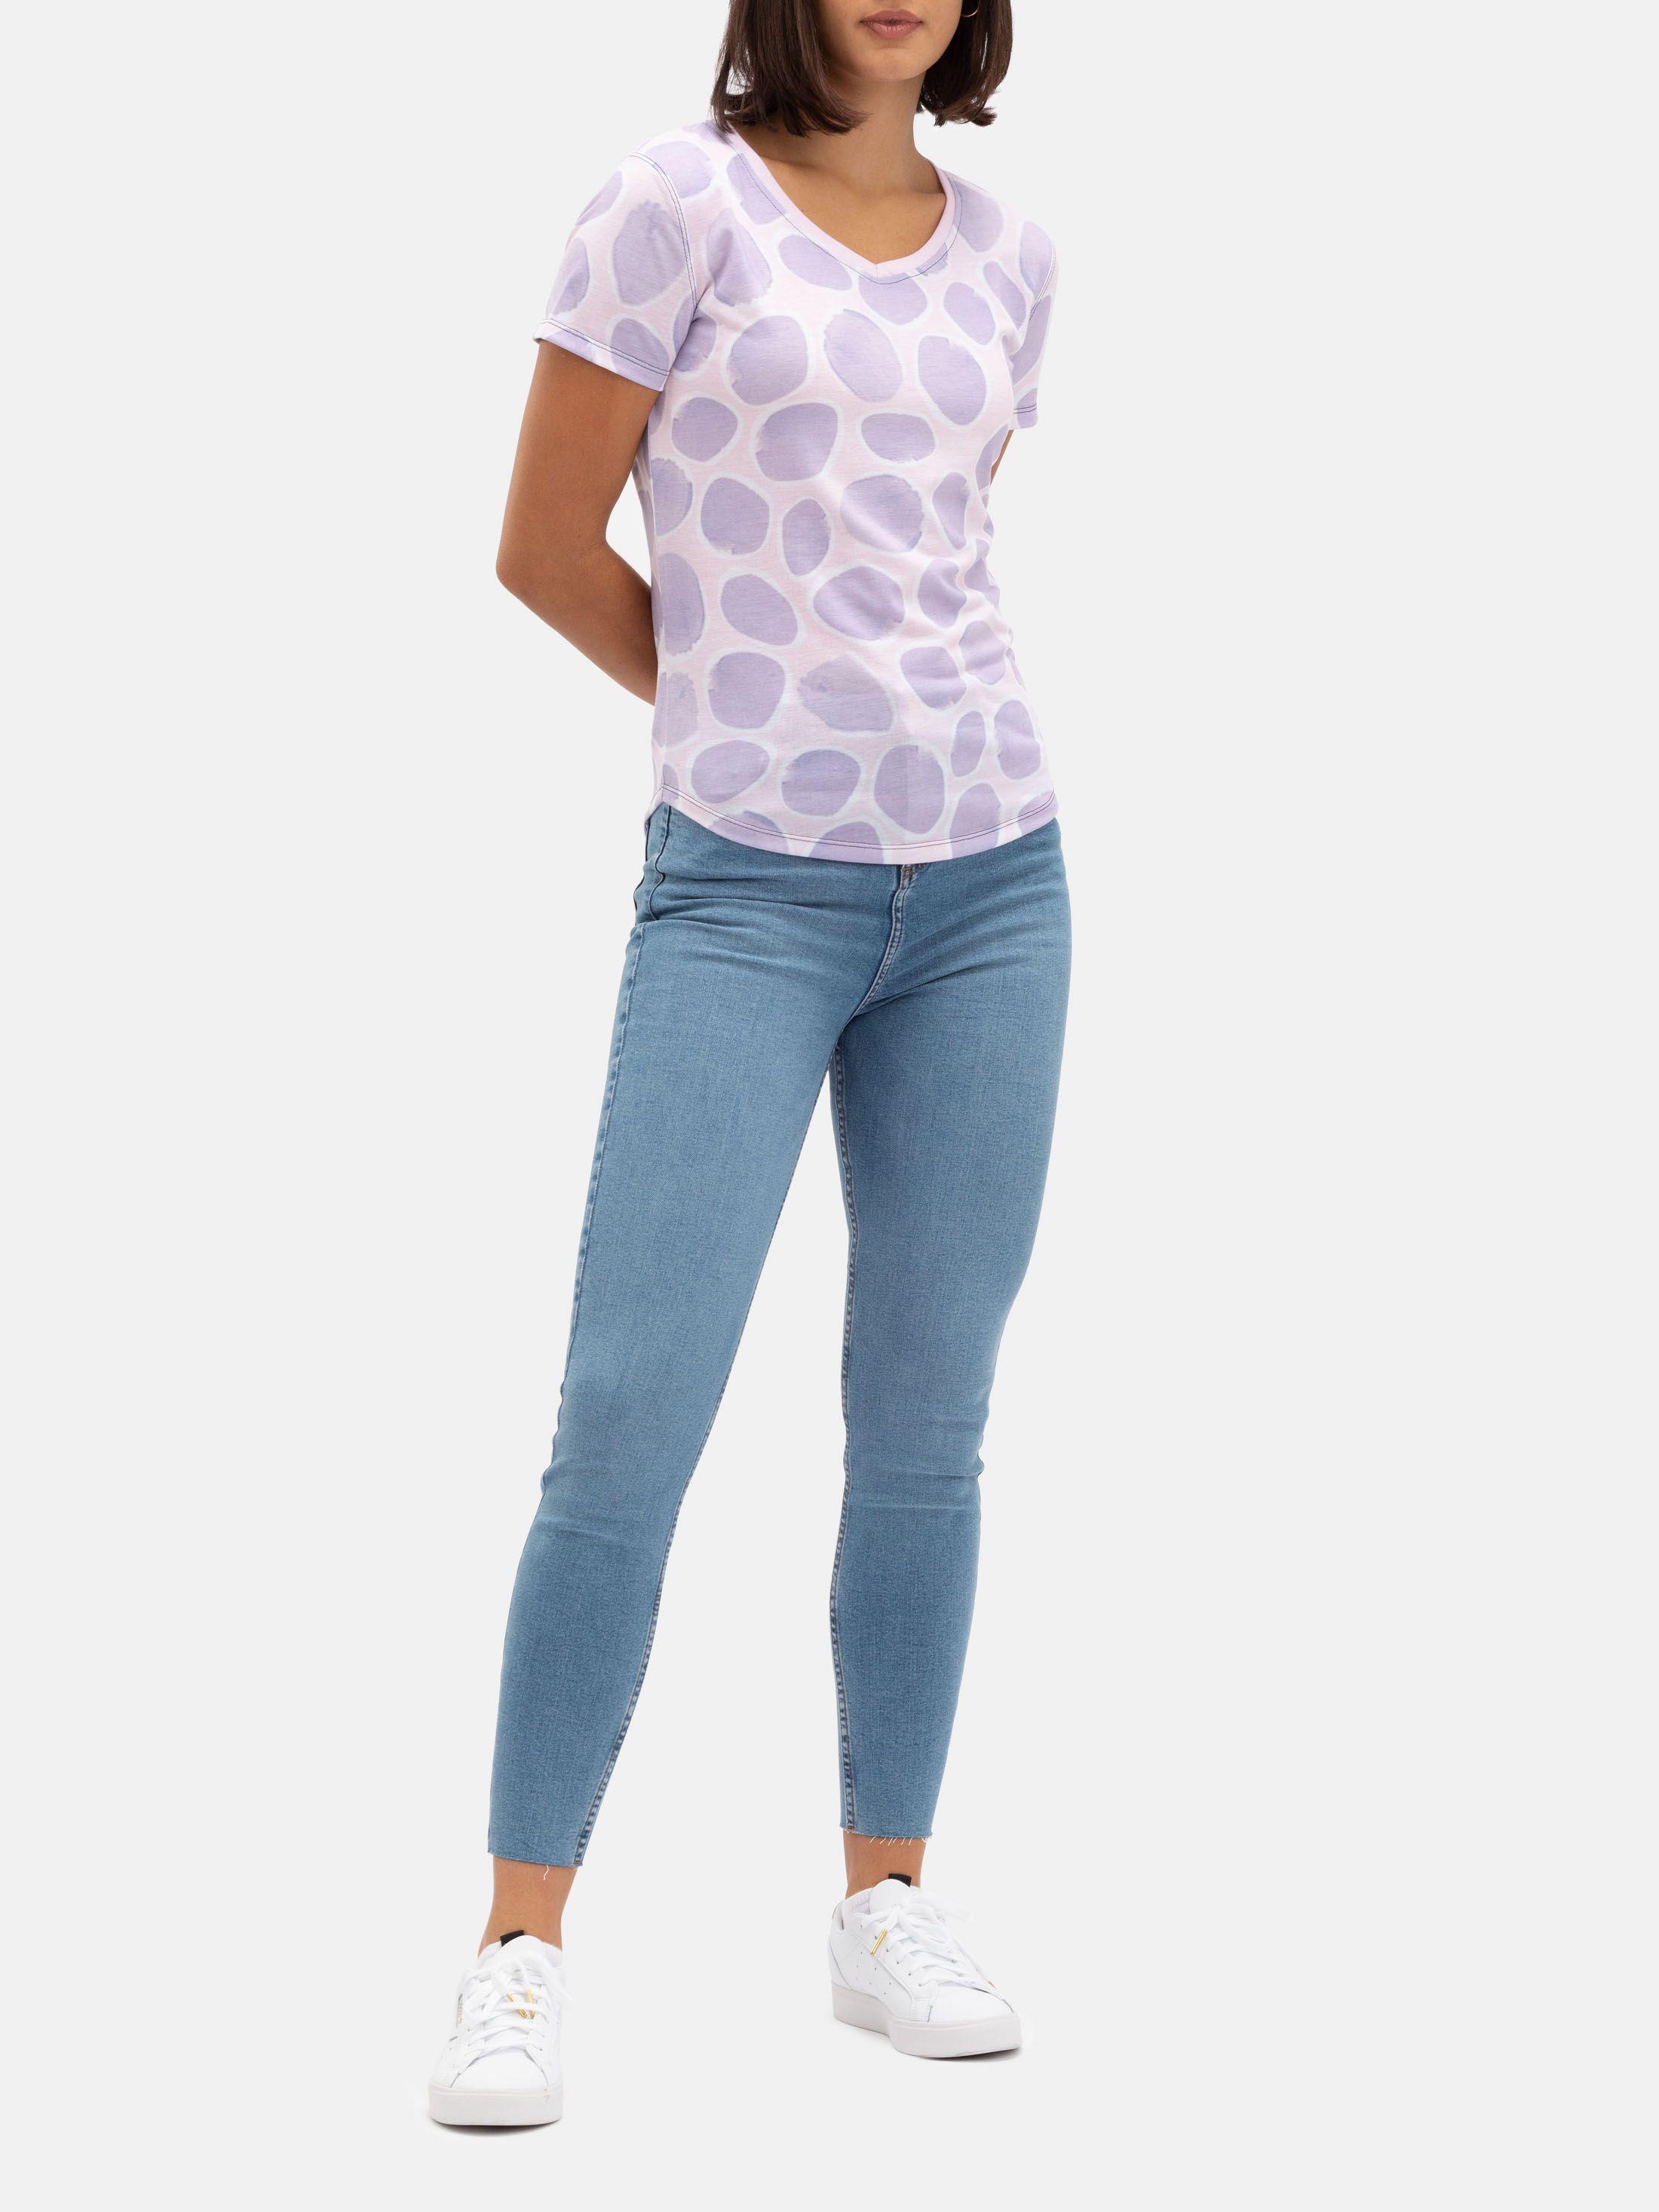 Womens V-Neck Printed T Shirts